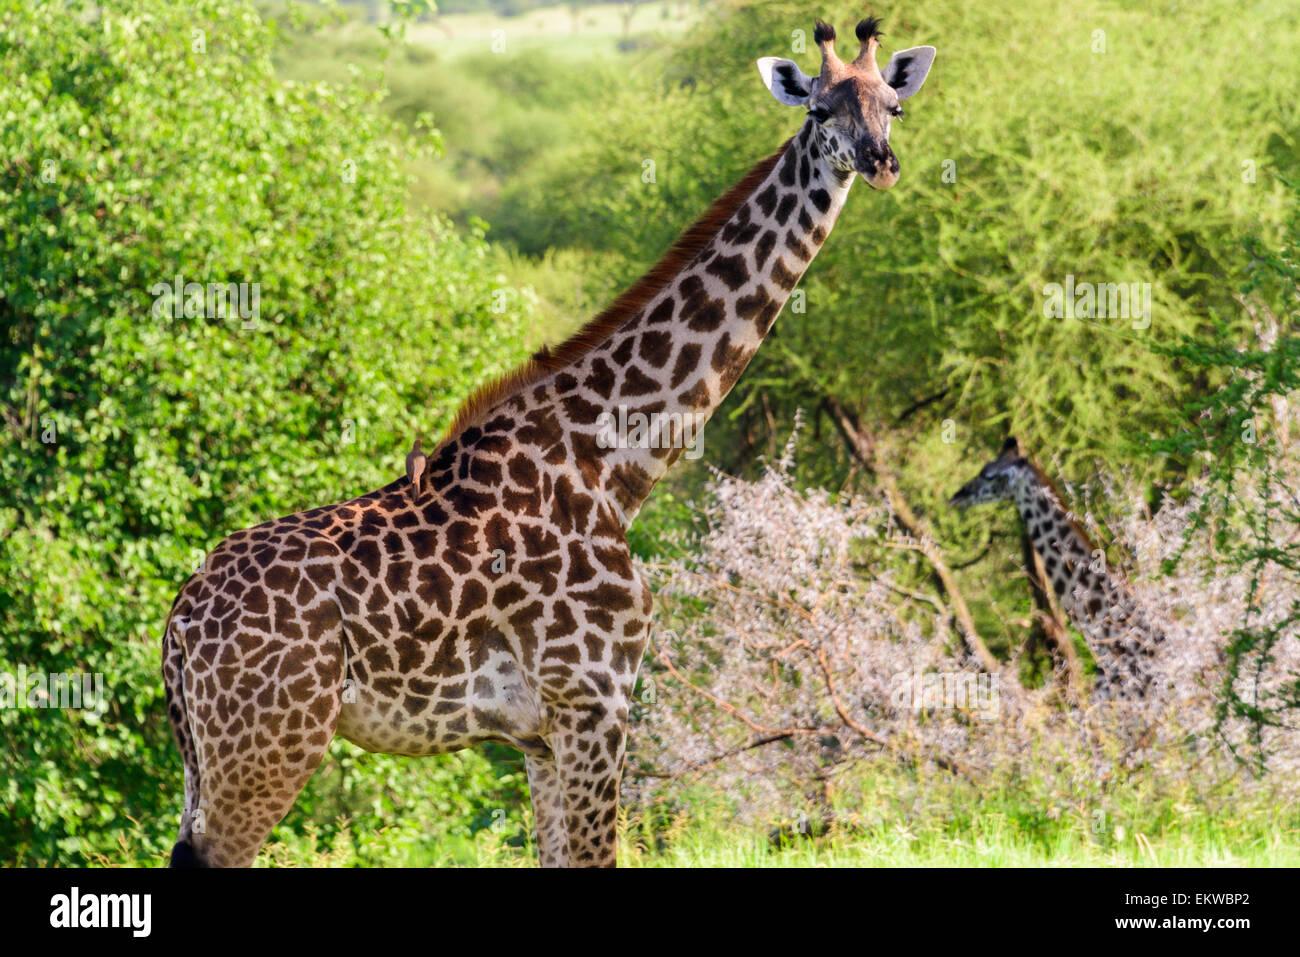 Giraffa camelopardalis Portrait of giraffe in Tarangire National Park, Manyara Region, Tanzania, Africa. - Stock Image